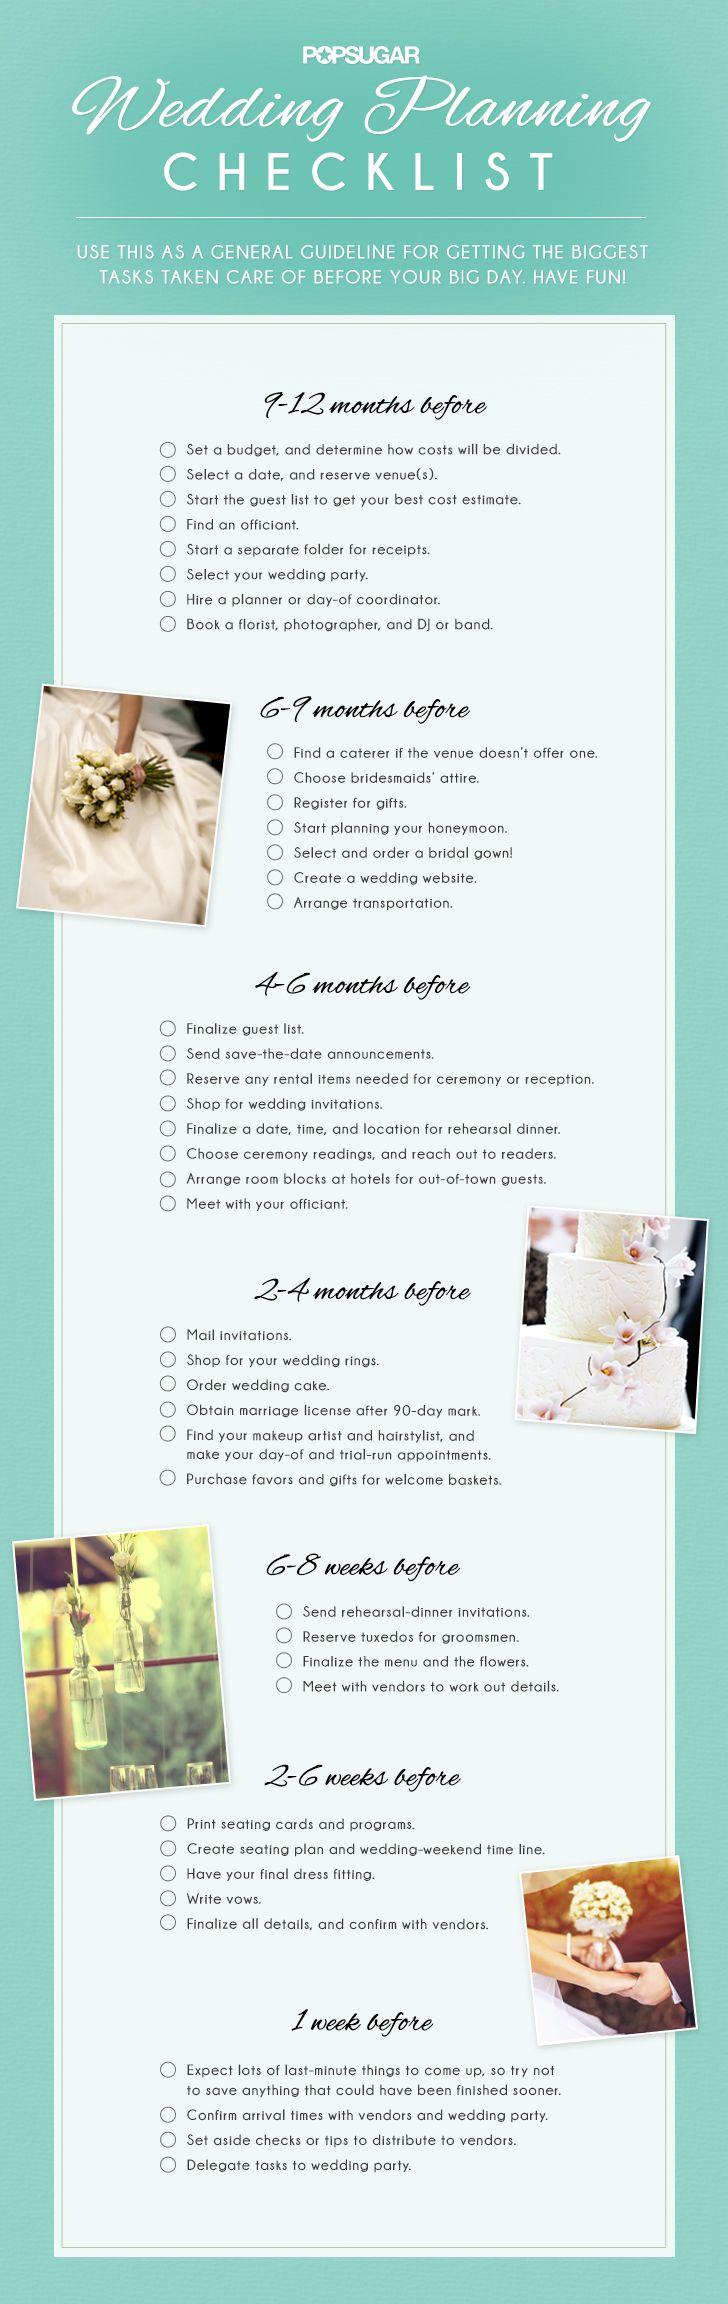 Last minute diy wedding decorations   best  images on Pinterest  Wedding inspiration Getting